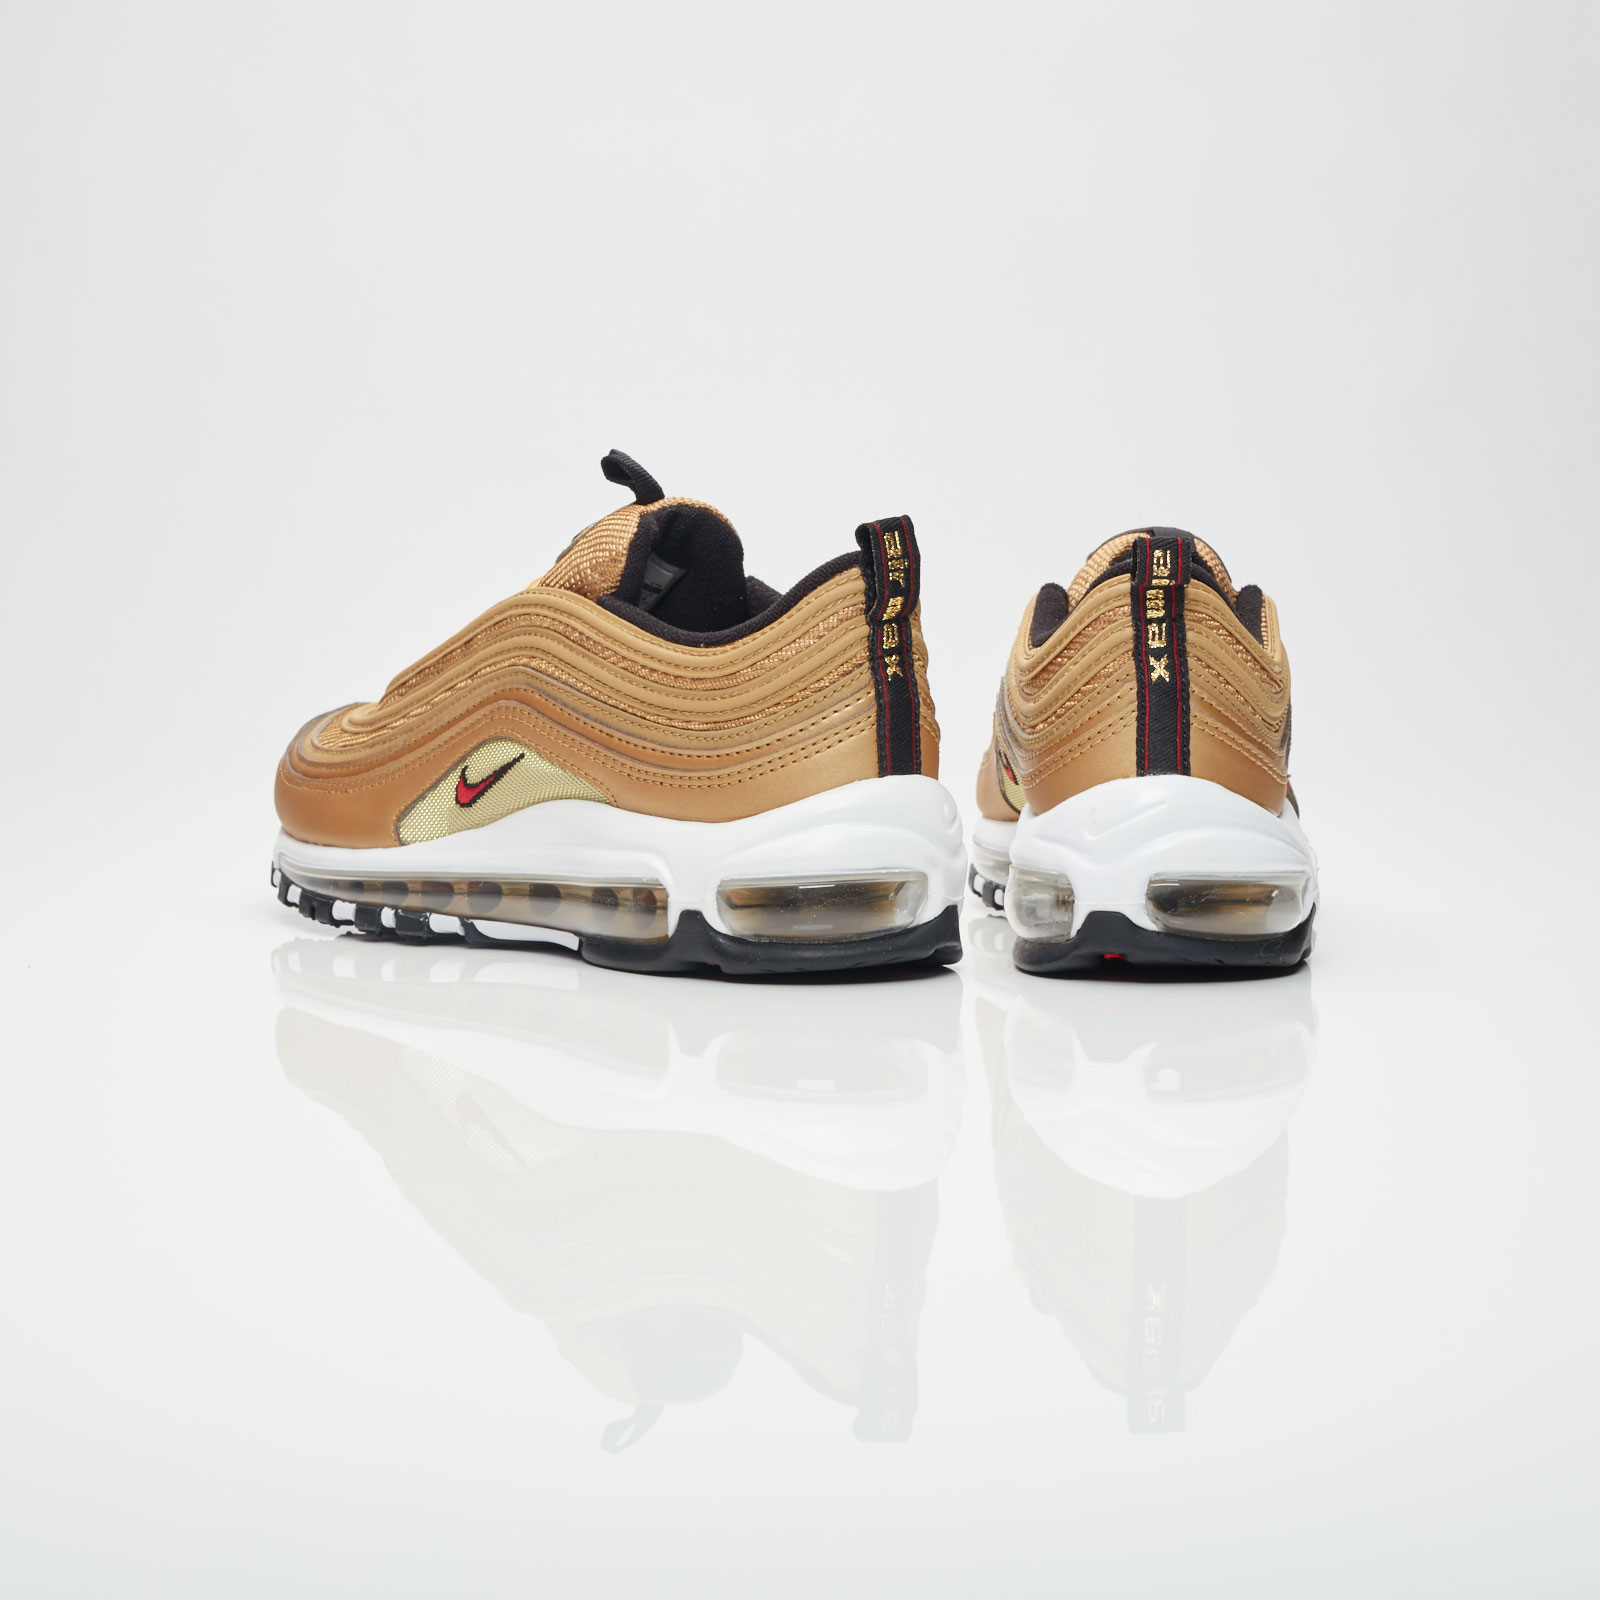 online store b7407 fb931 Nike Wmns Air Max 97 OG QS - 885691-700 - Sneakersnstuff   sneakers    streetwear online since 1999